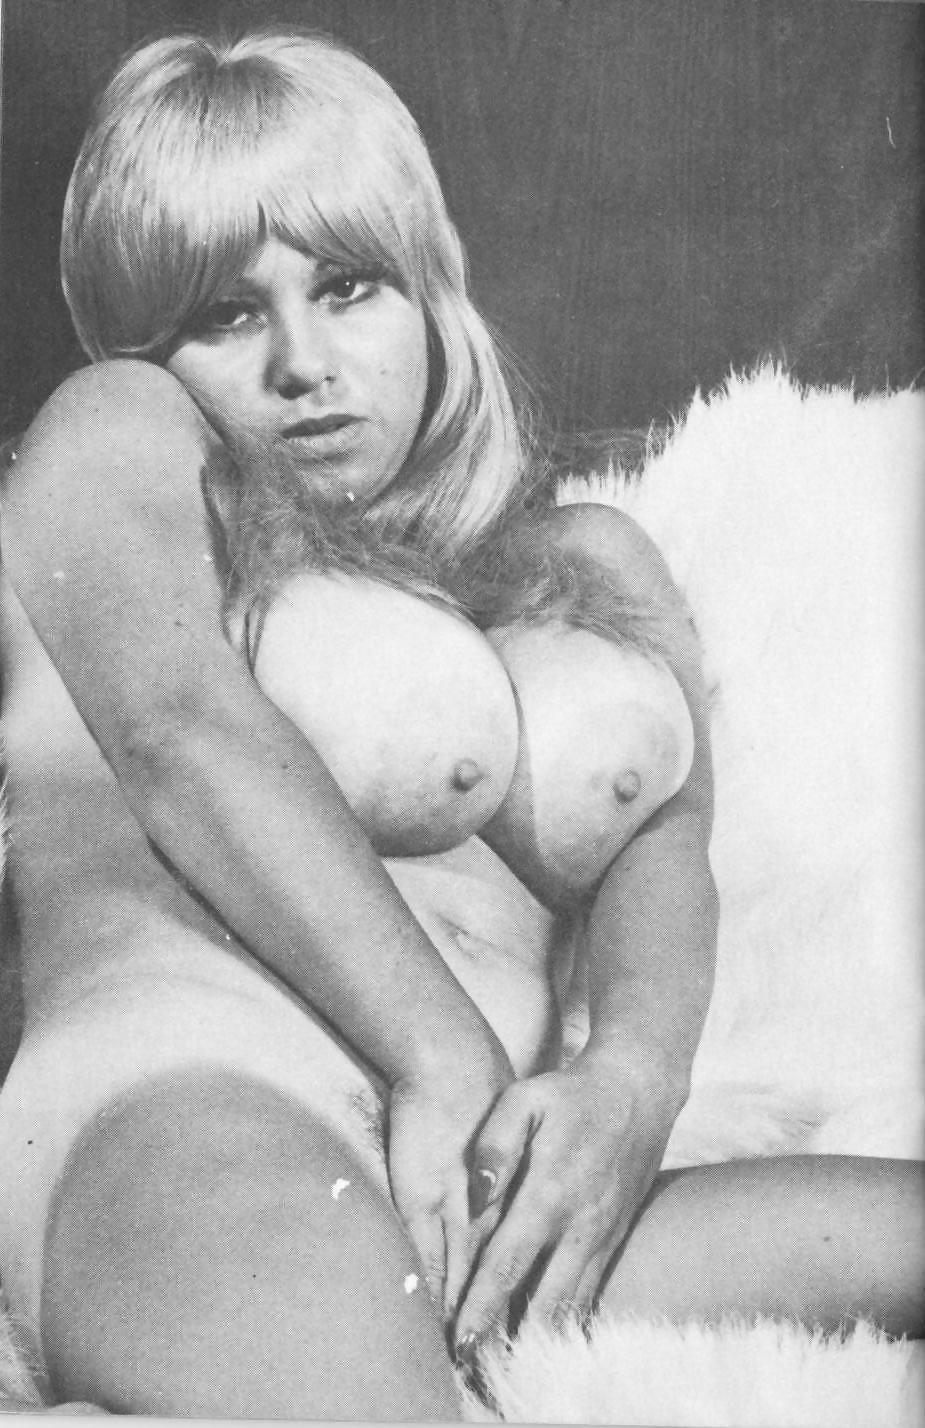 Nude pics 2020 Adult women masterbating